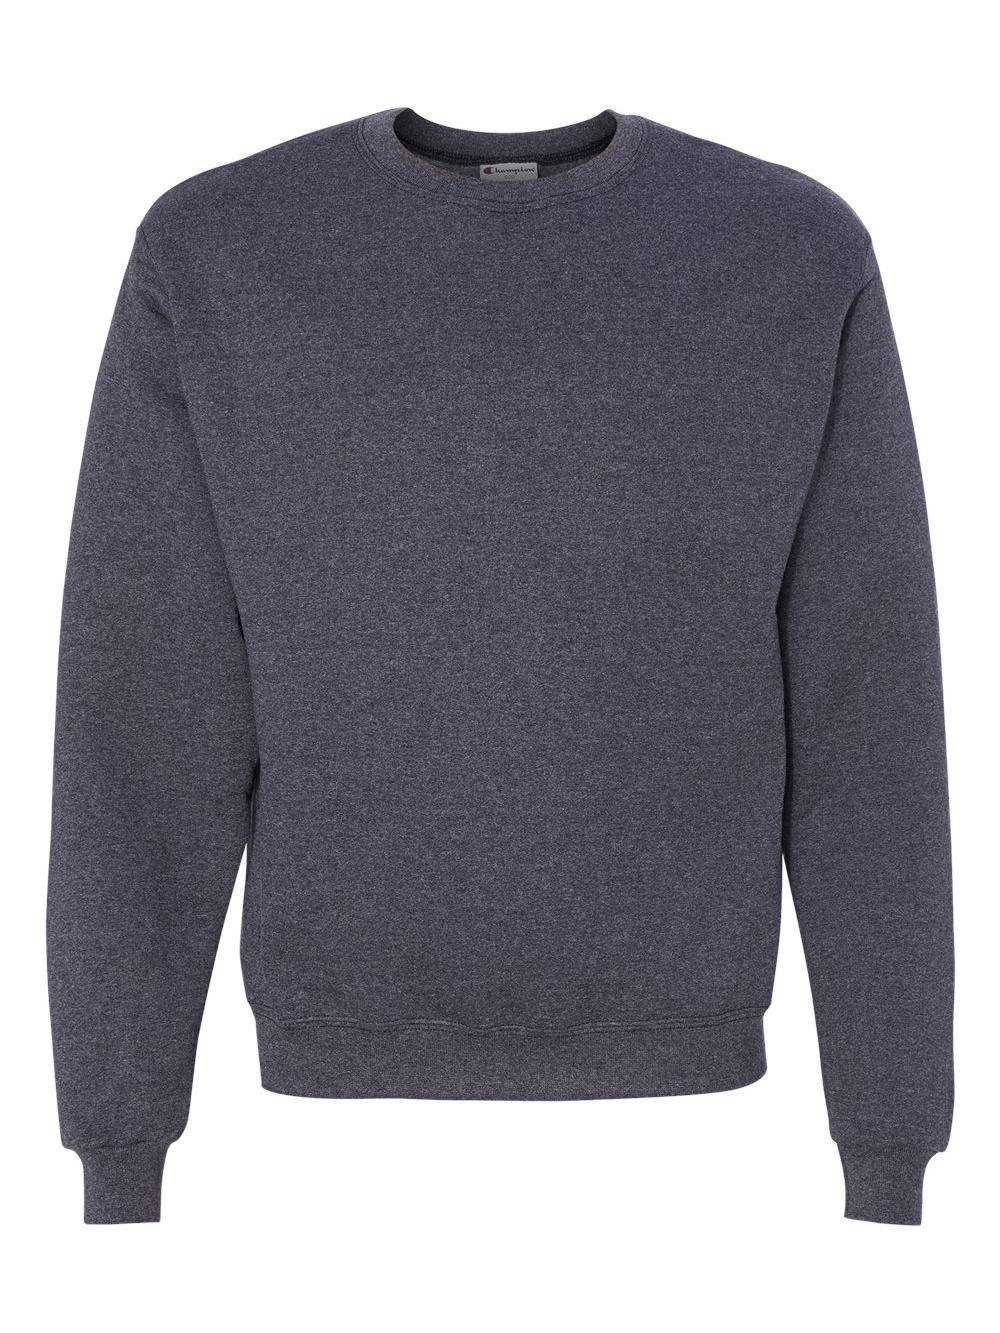 Champion-Double-Dry-Eco-Crewneck-Sweatshirt-S600 thumbnail 21